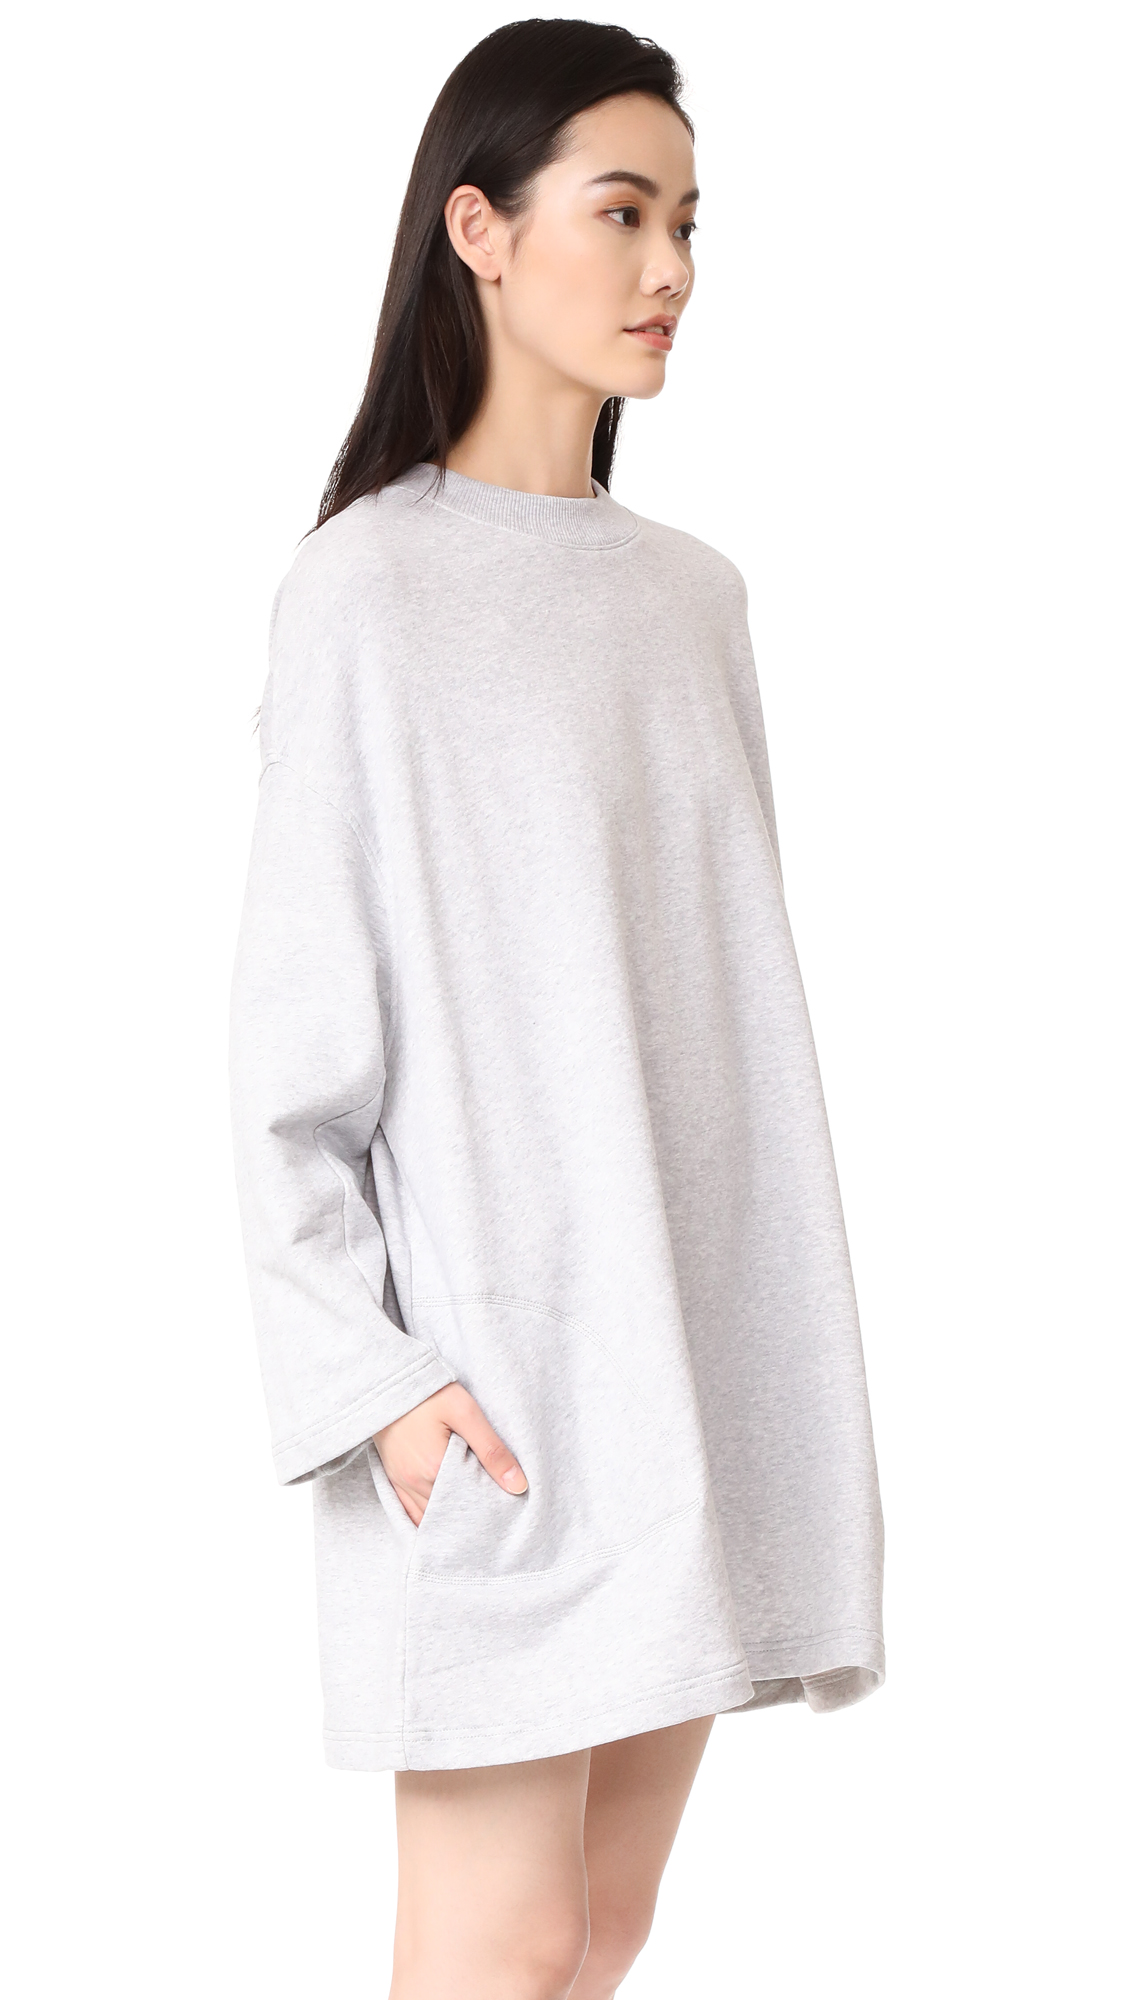 6e63f2e10e4 Acne Studios Leyla Oversized Sweatshirt